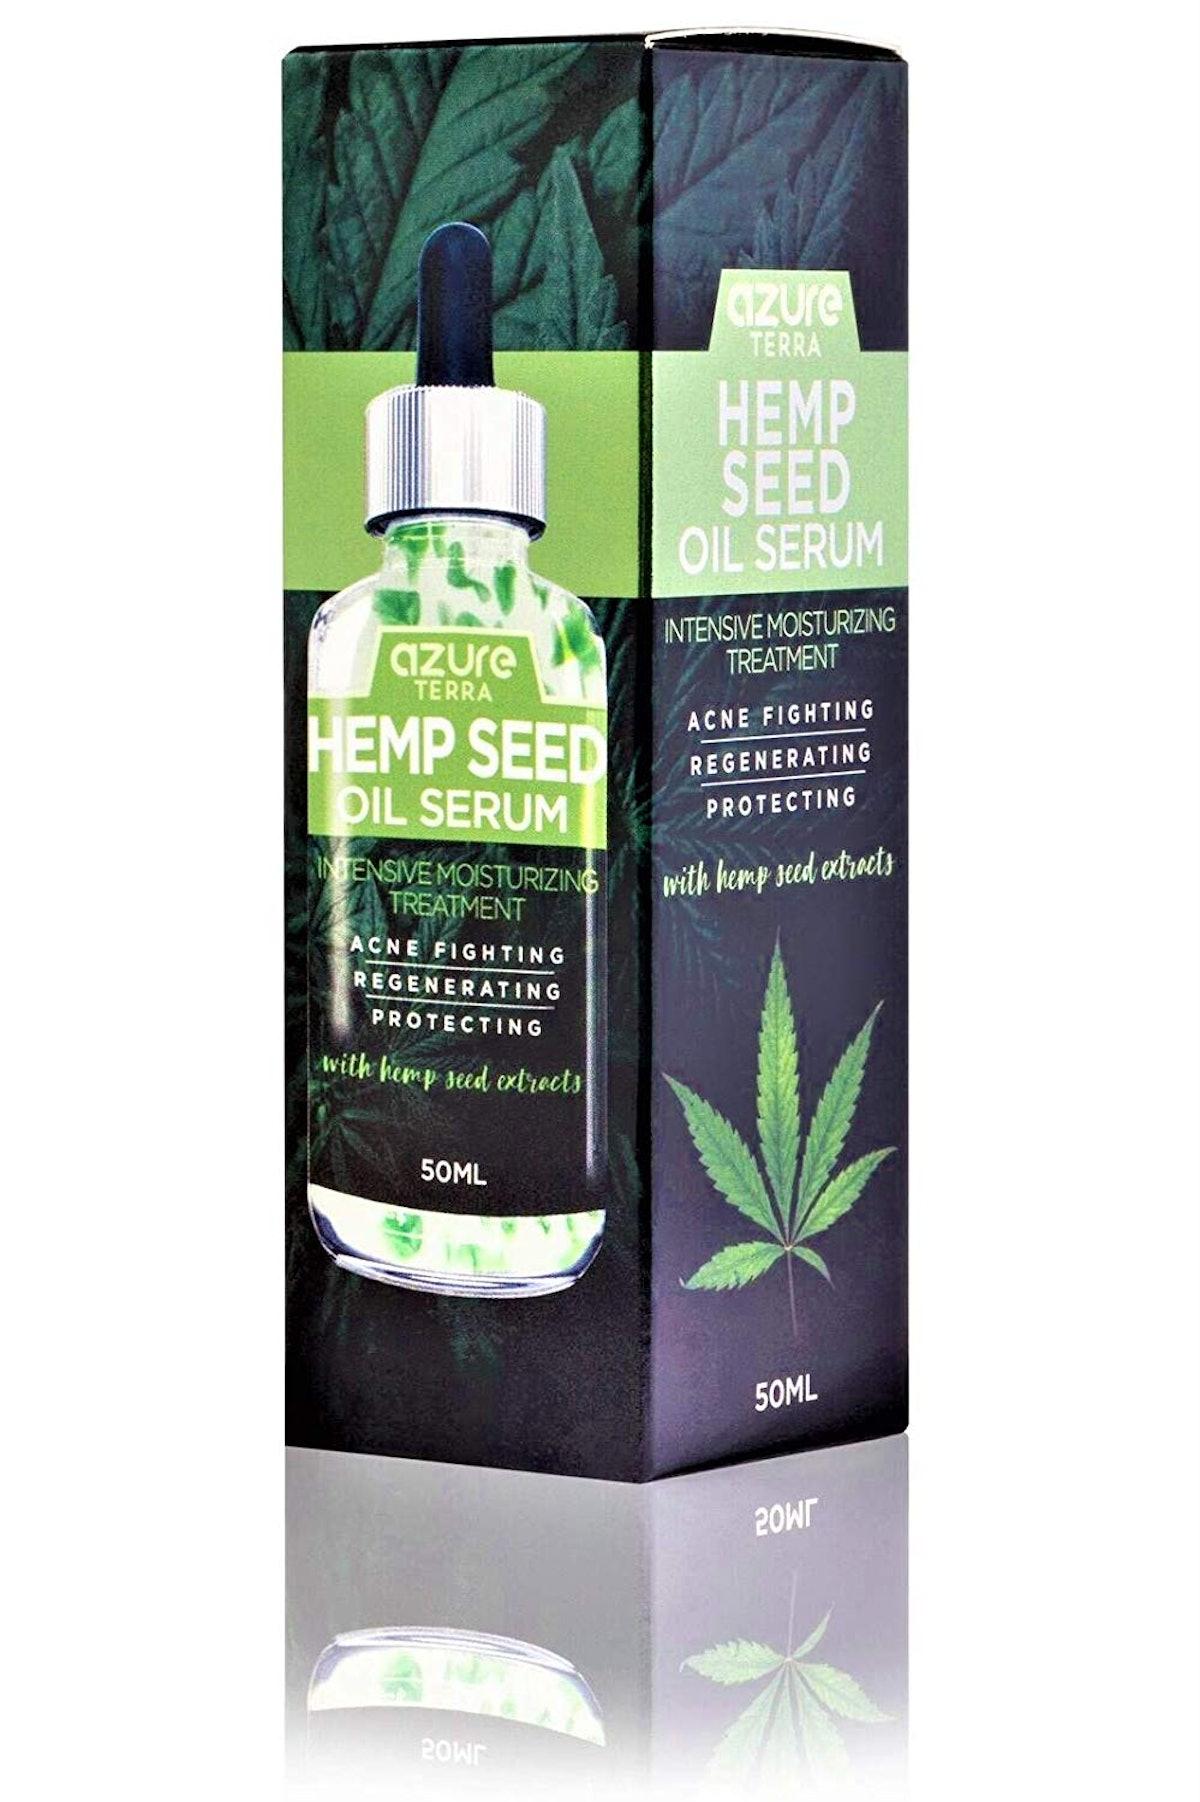 Azure Cosmetics Hemp Seed Oil Serumq